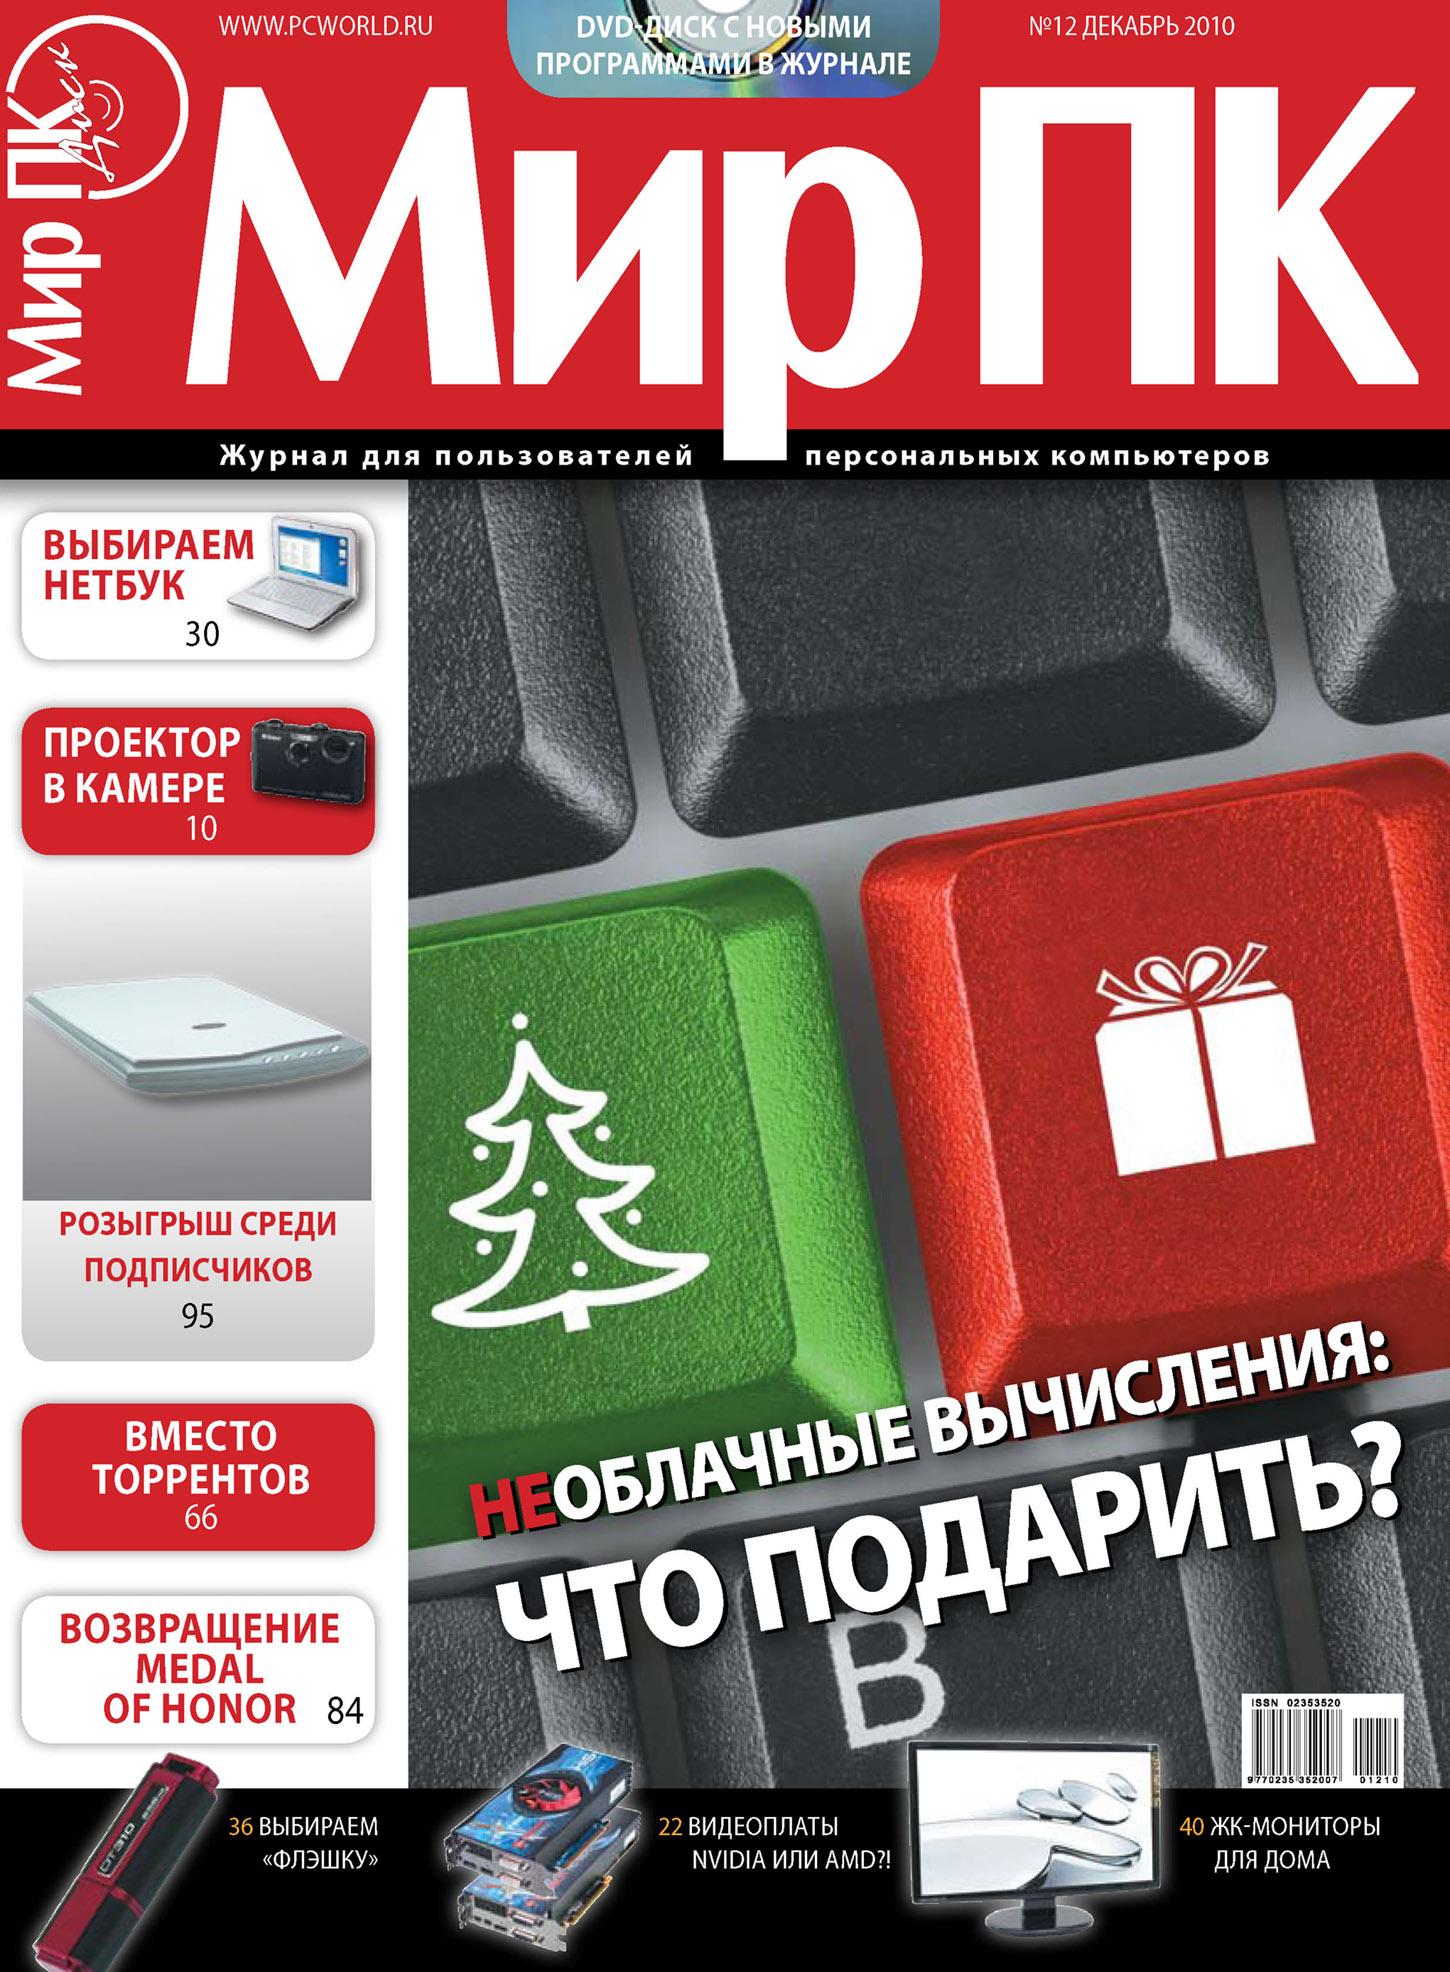 Журнал Мир ПК № 12/2010